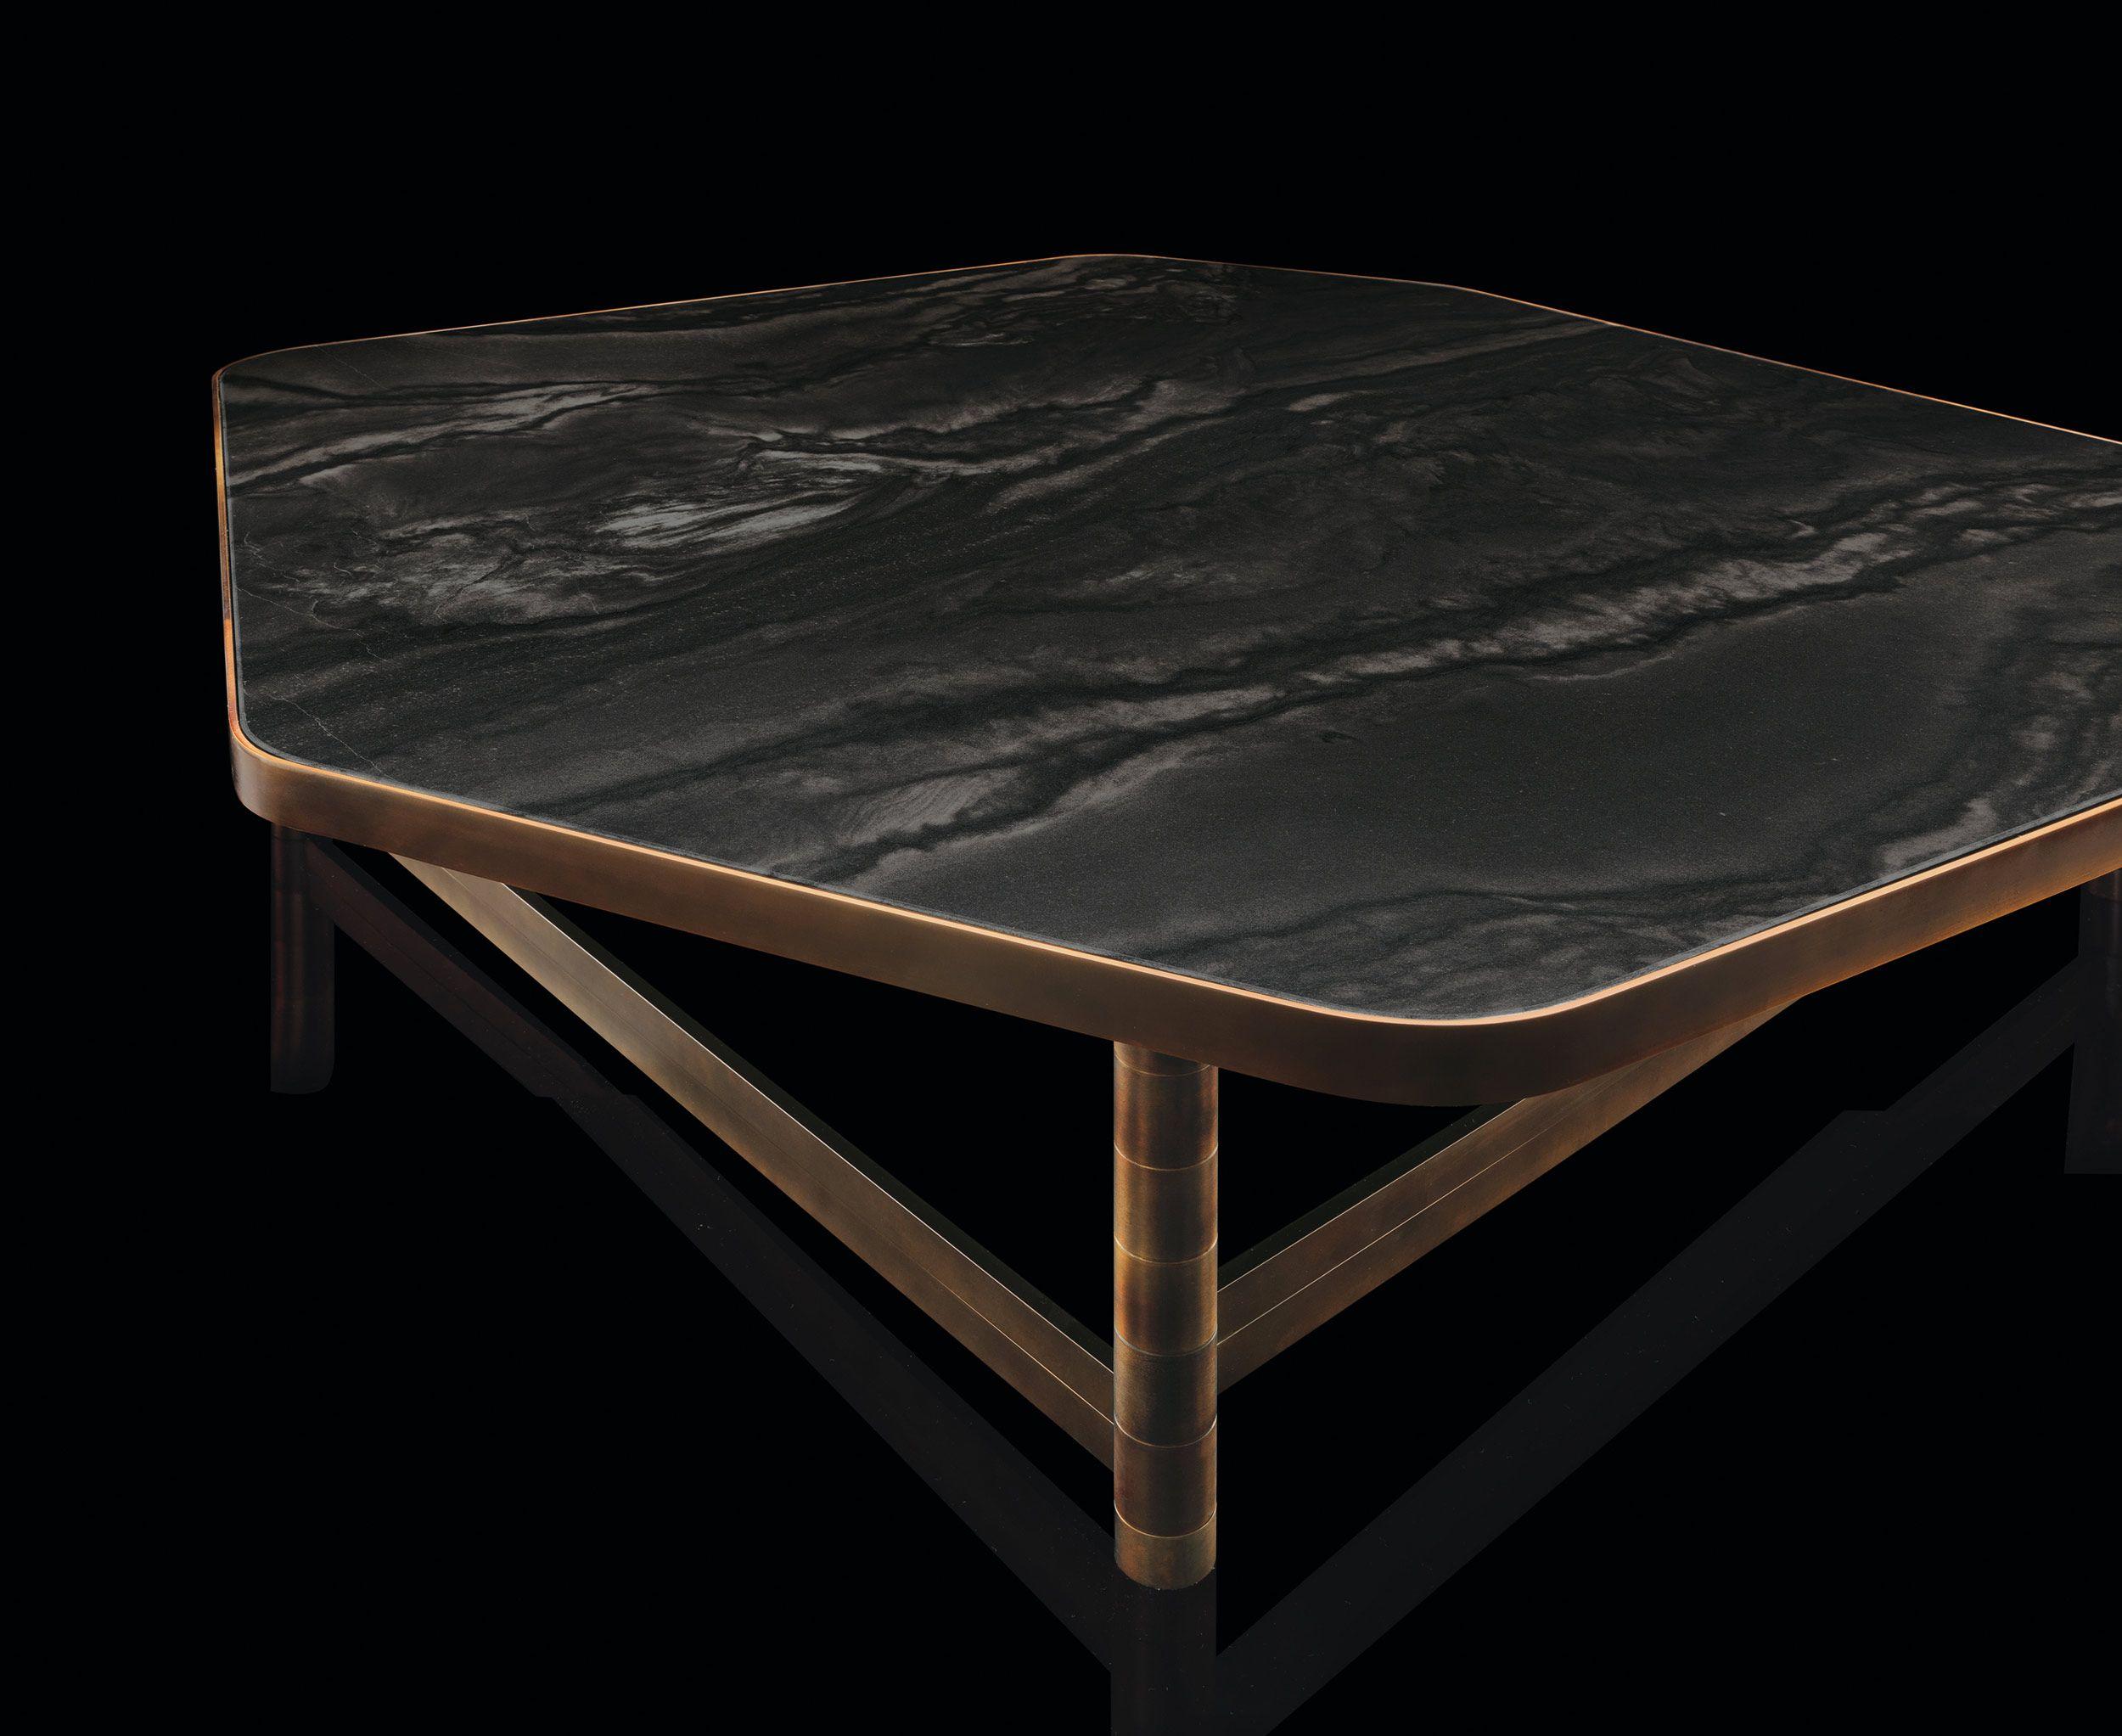 Henge design furniture table basse table en bois meubles en bois mobilier